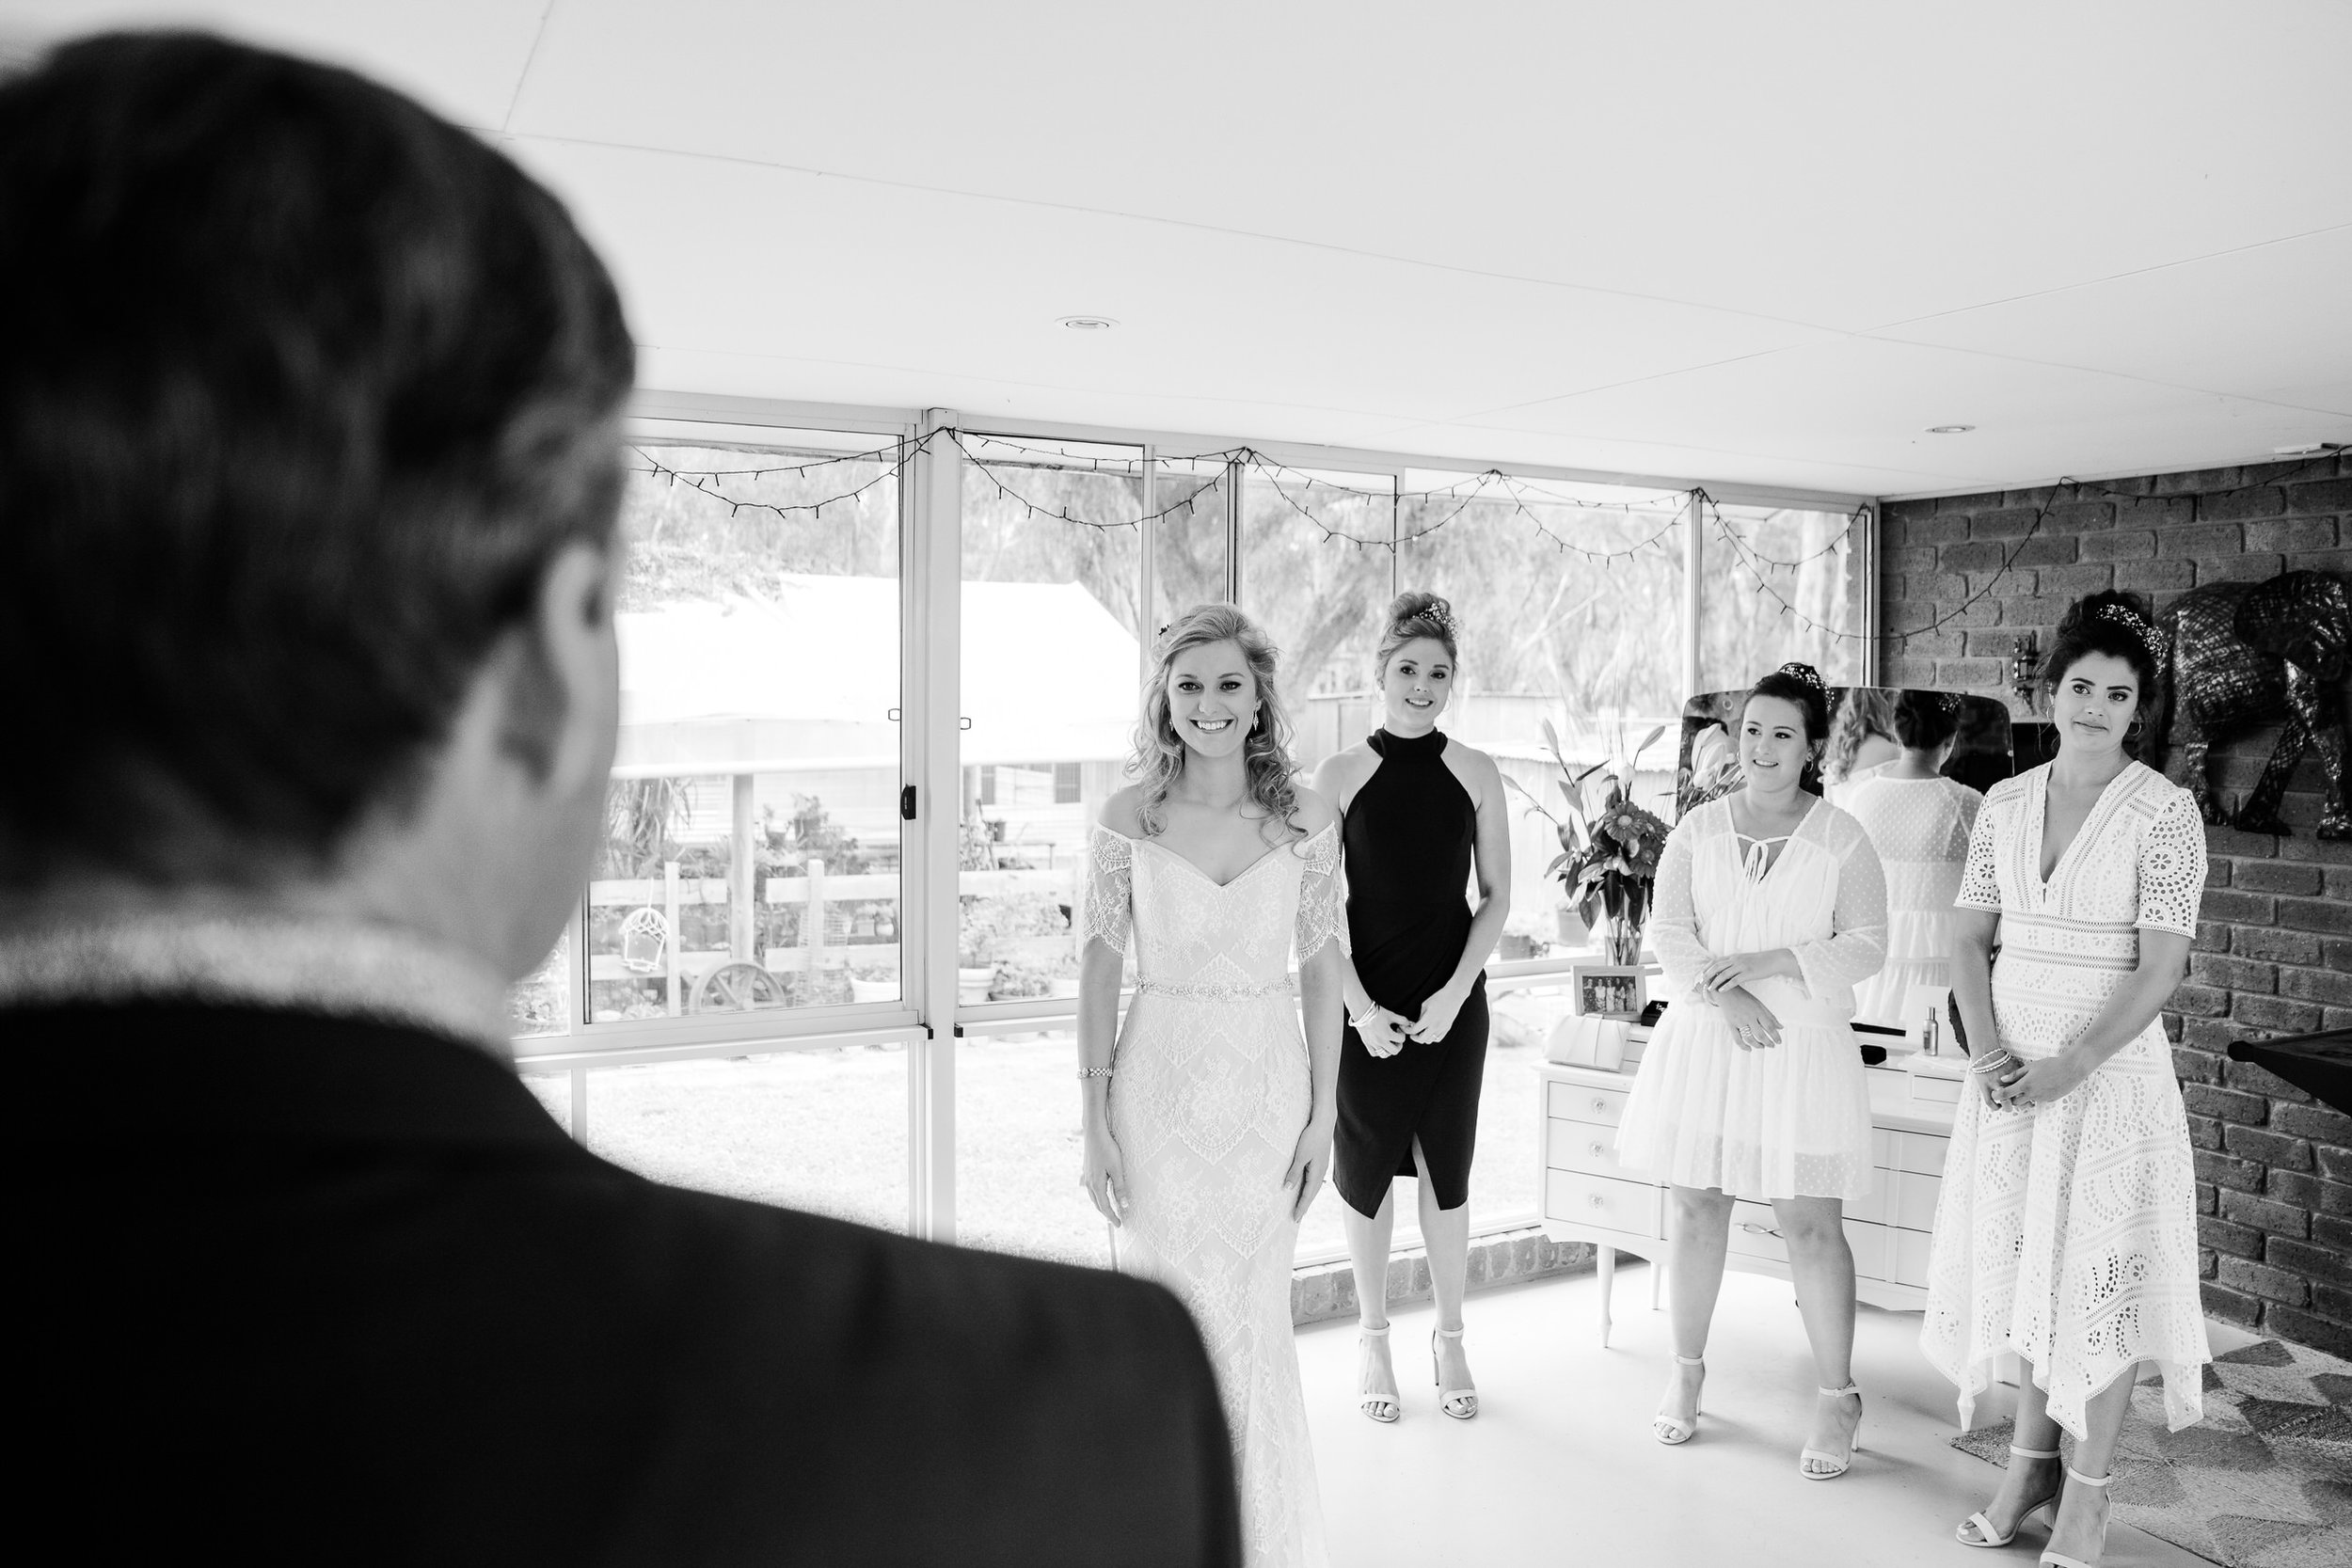 Justin_And_Jim_Photography_Backyard_Wedding151.JPG